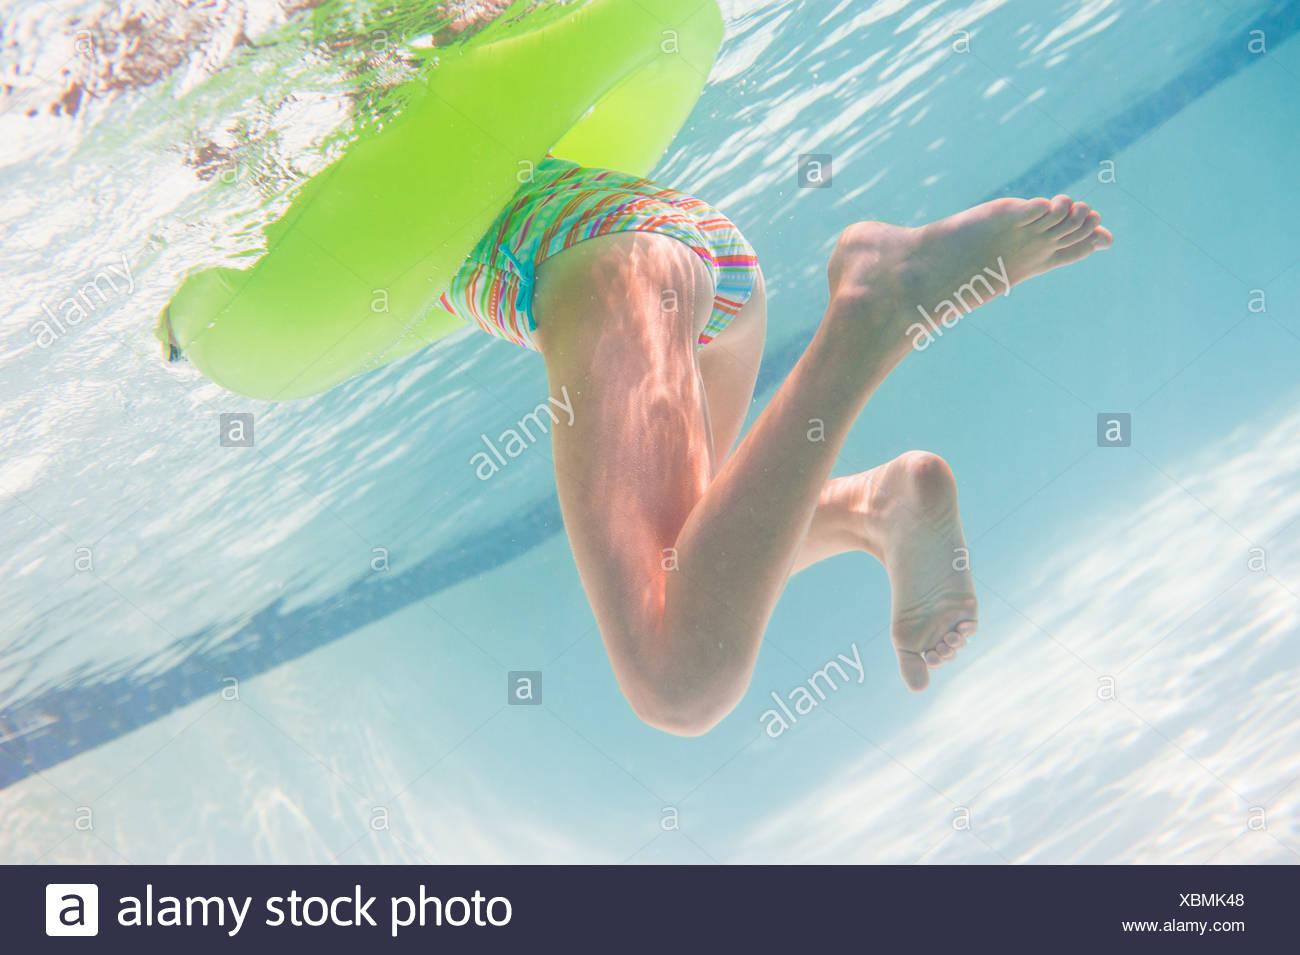 USA, New York State, Old Westbury, Girl swimming underwater - Stock Image